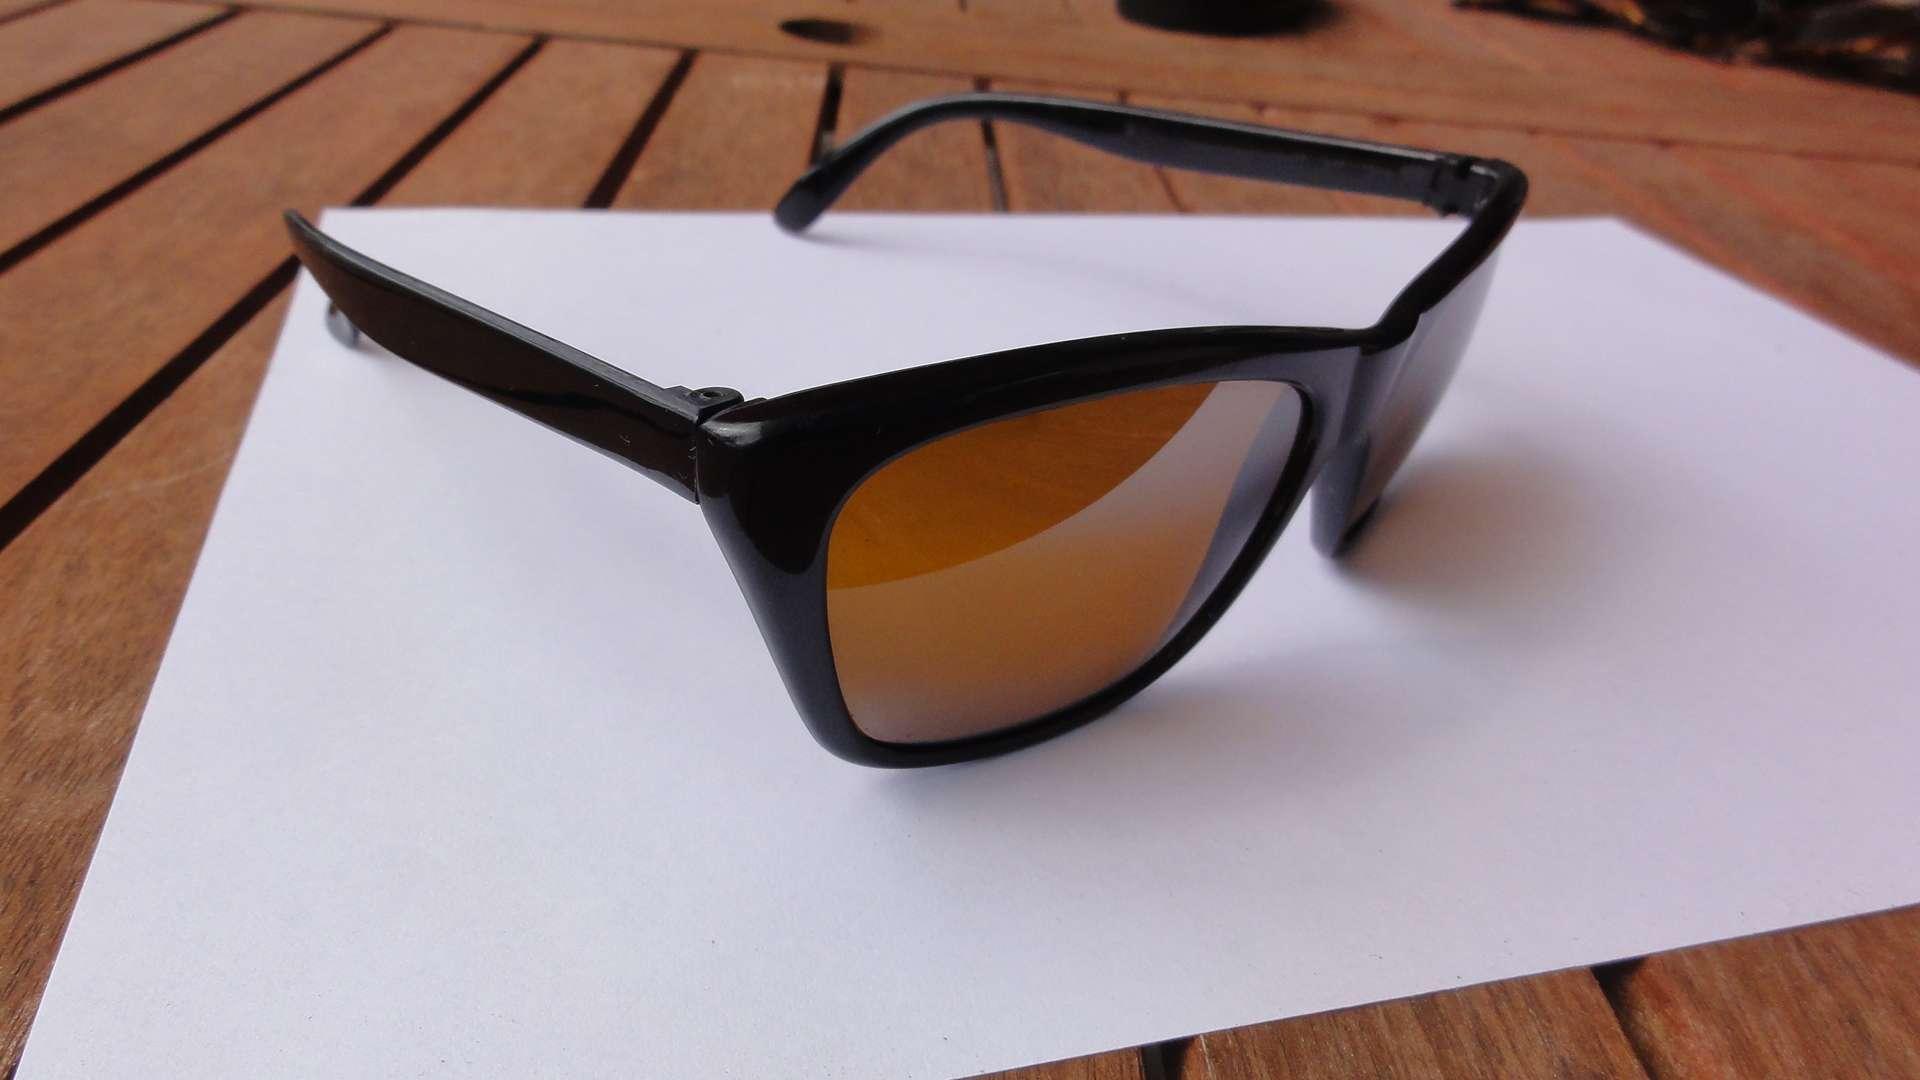 Vuarnet Sunglasses Pouilloux 438   City of Kenmore, Washington 4d5c3848b5